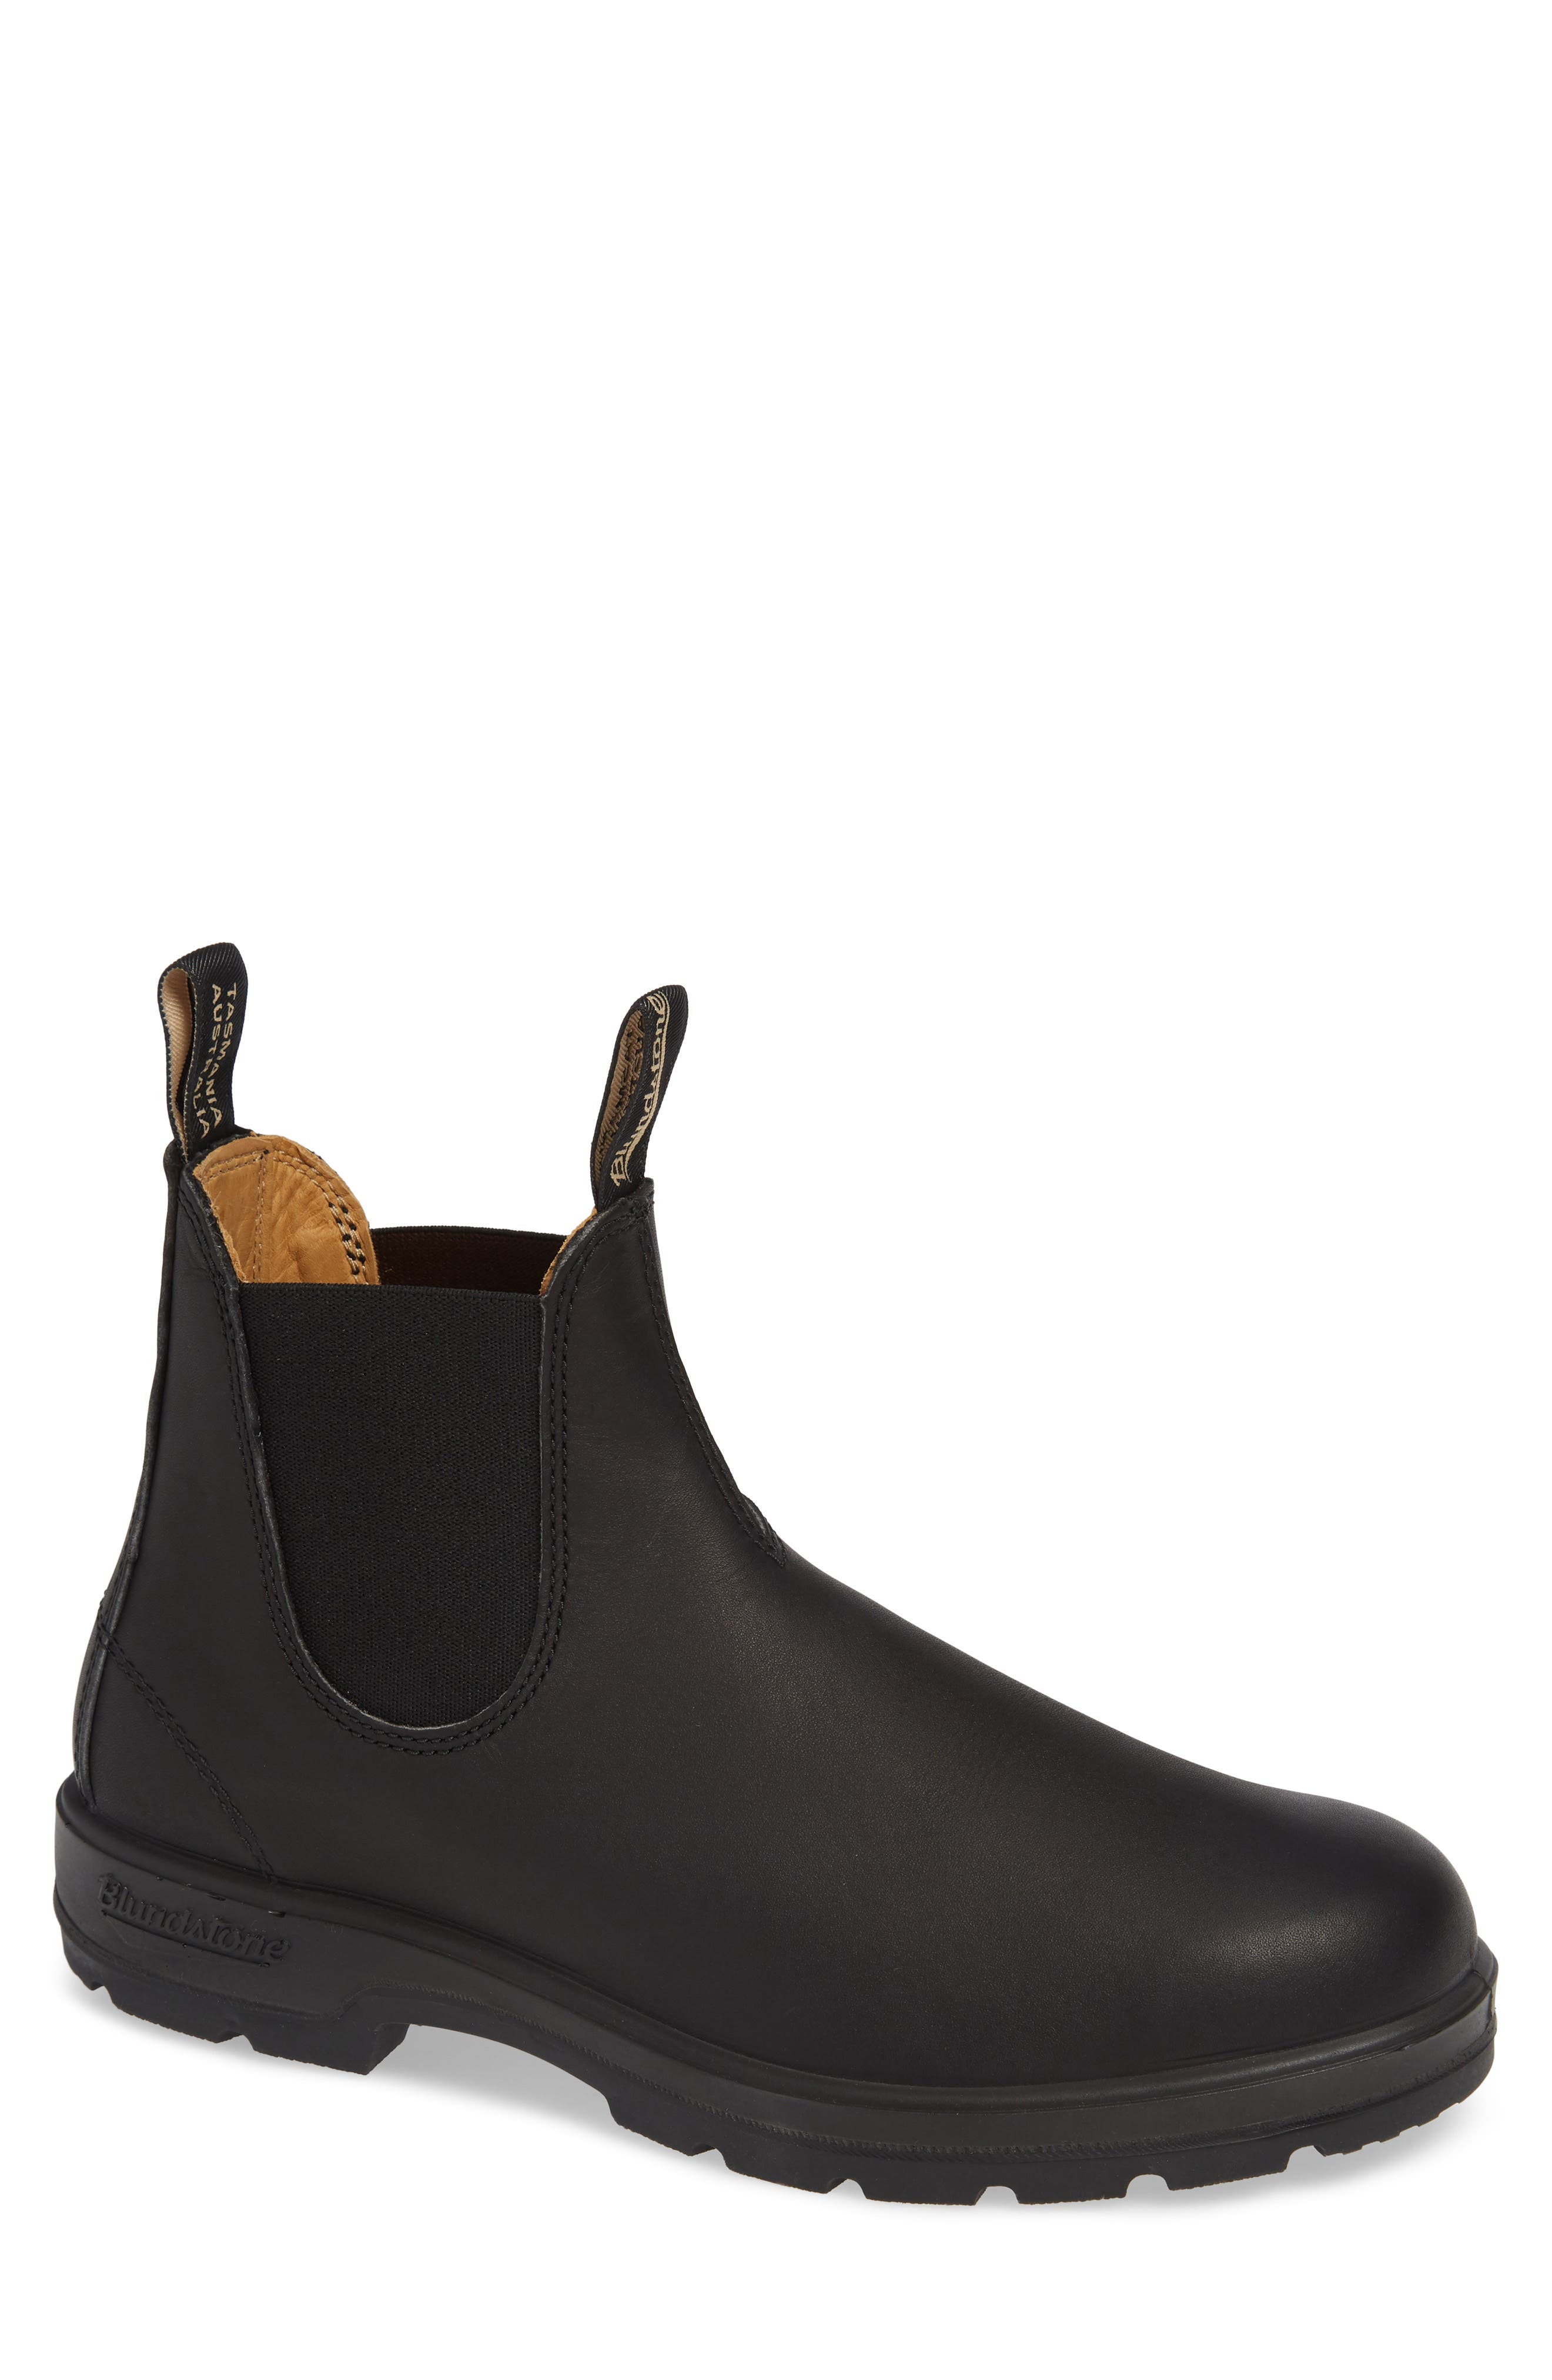 BLUNDSTONE FOOTWEAR, Chelsea Boot, Main thumbnail 1, color, BLACK